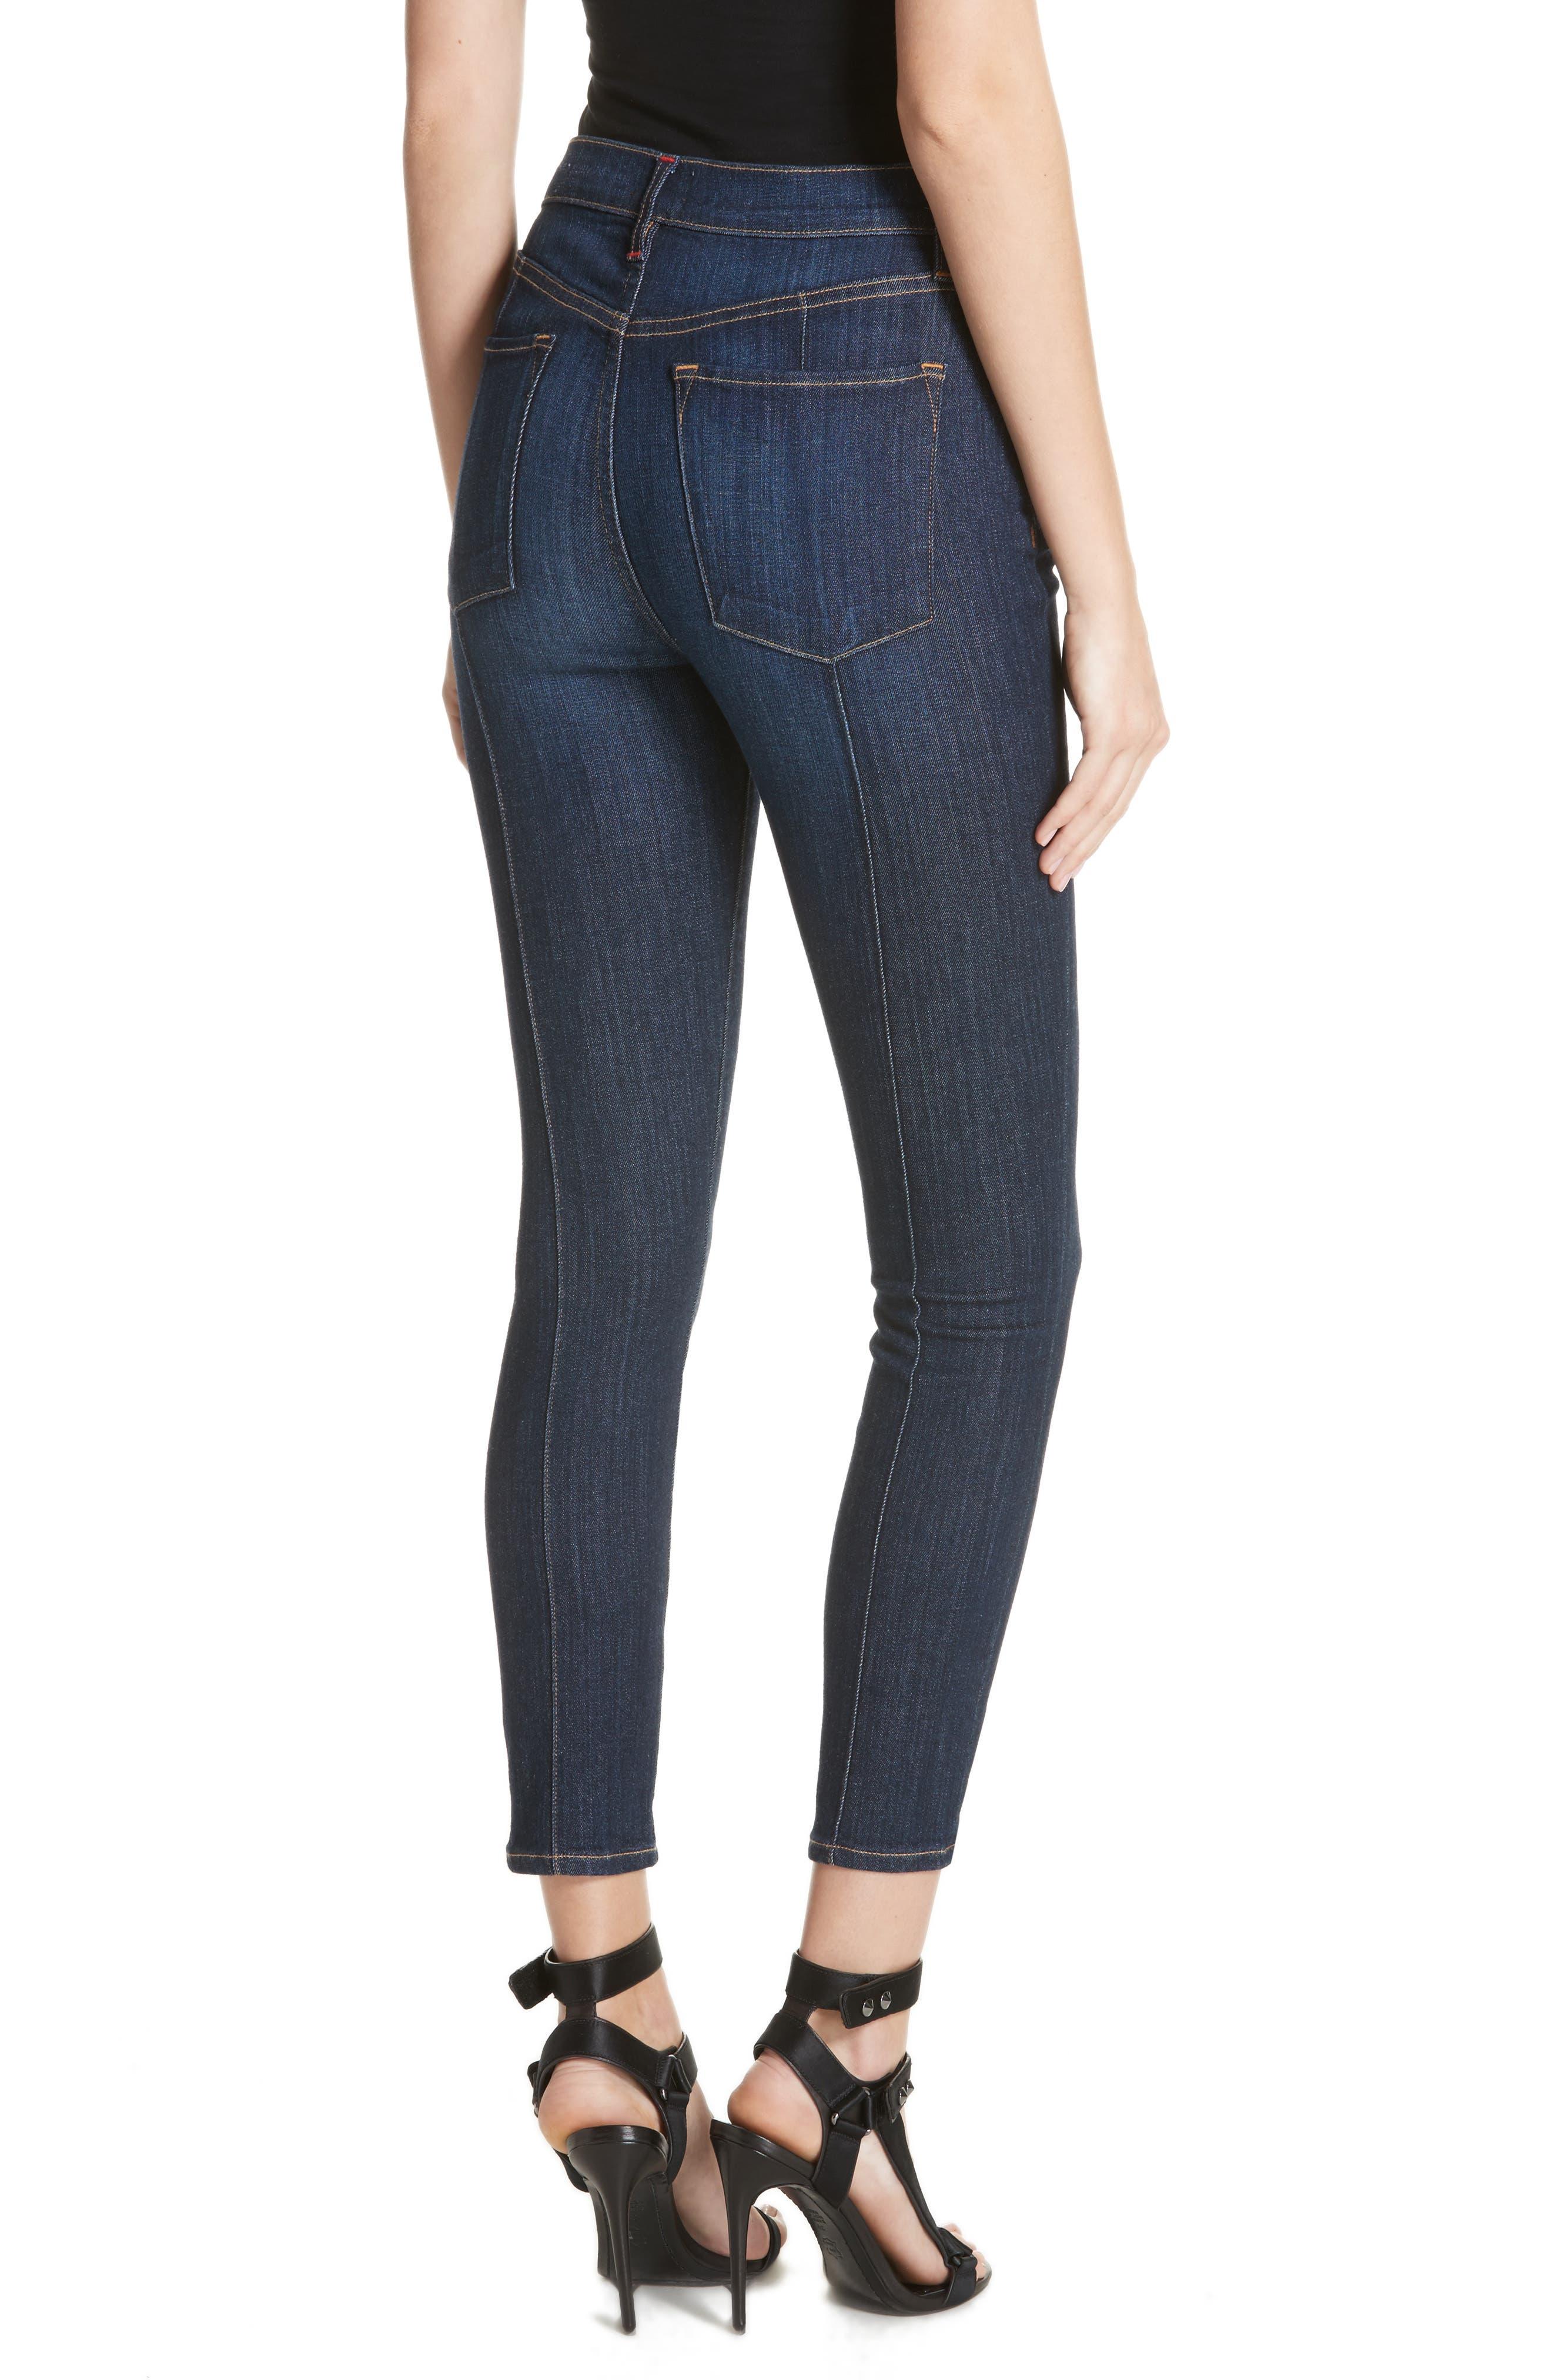 AO.LA Good High Waist Pintuck Skinny Jeans,                             Alternate thumbnail 2, color,                             Dream On